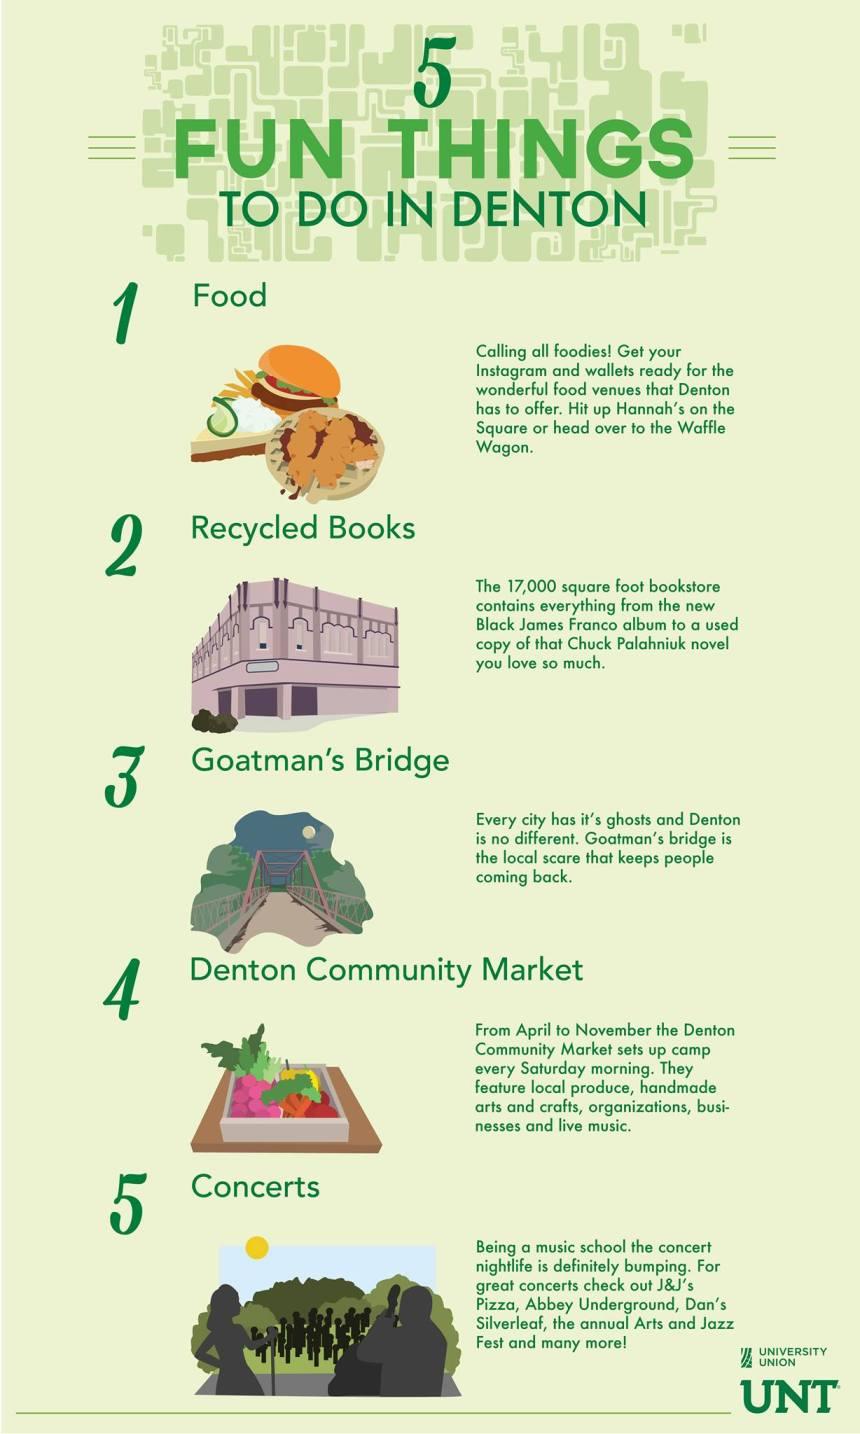 5 fun things to do in denton